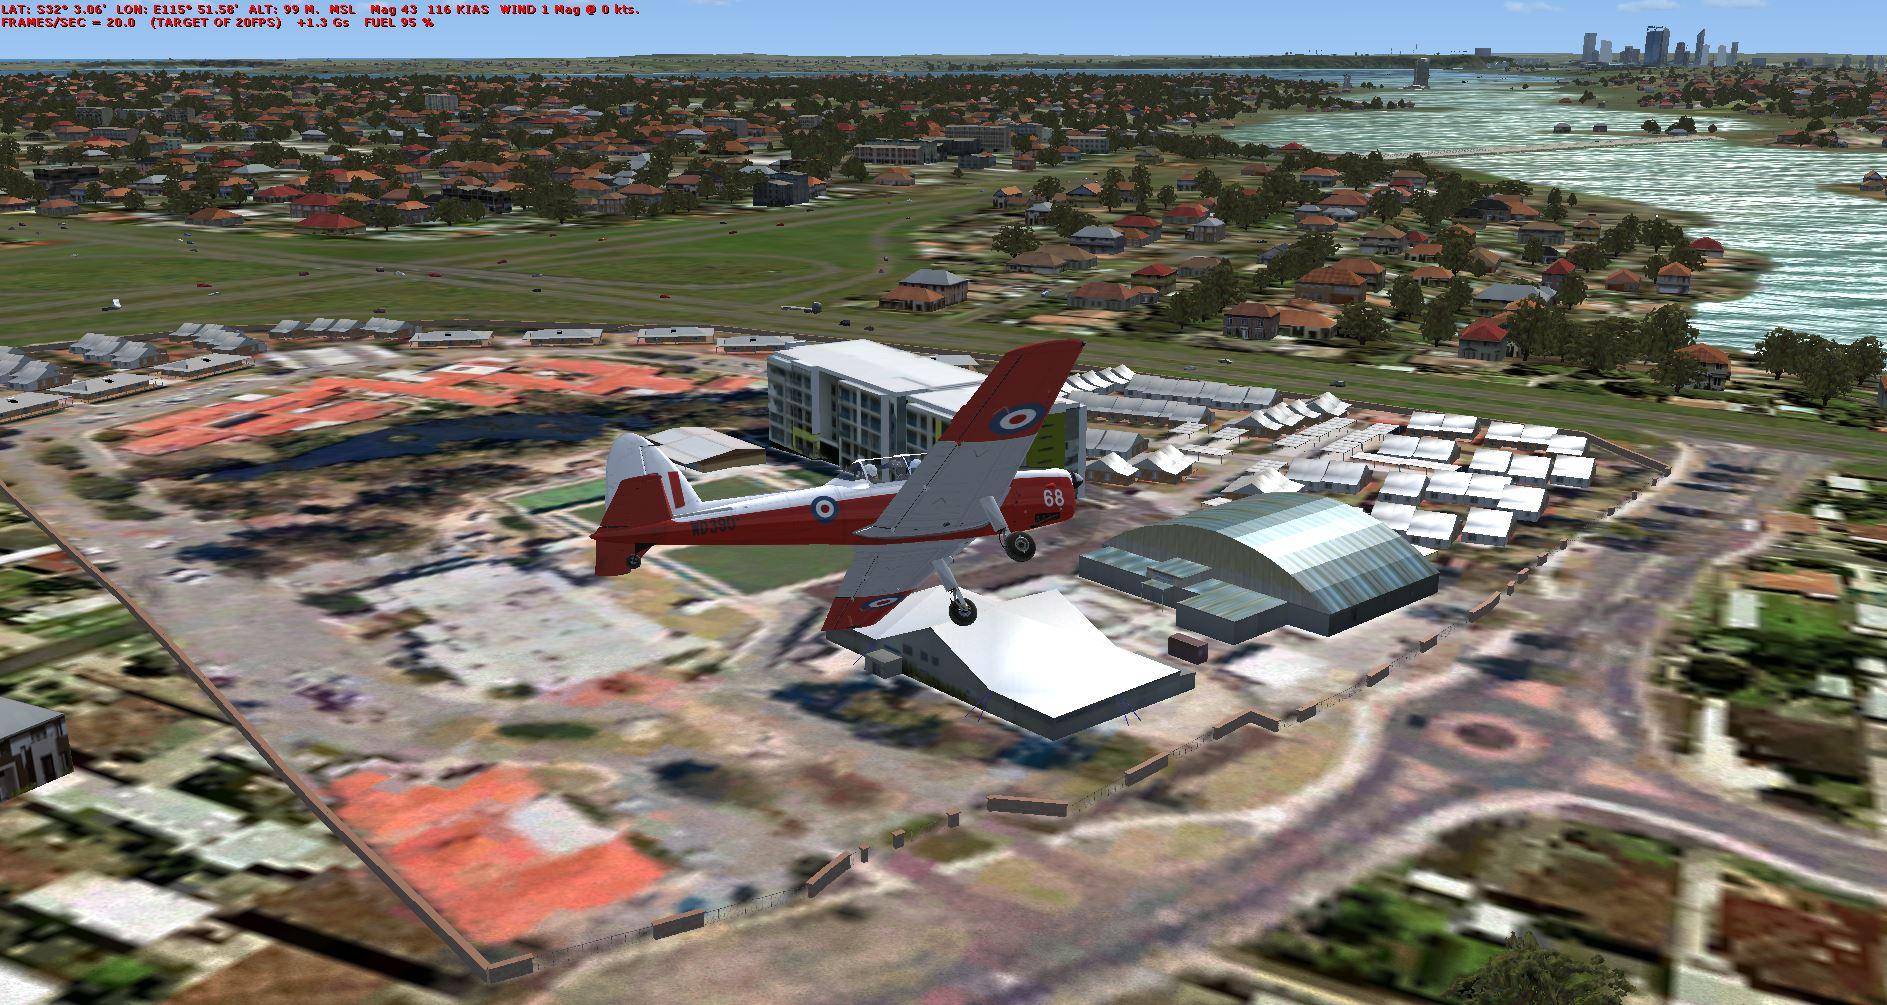 Bull Creek Australia  City new picture : ... FSX Airfields, RAAFA Bull Creek Museum and village, Western Australia